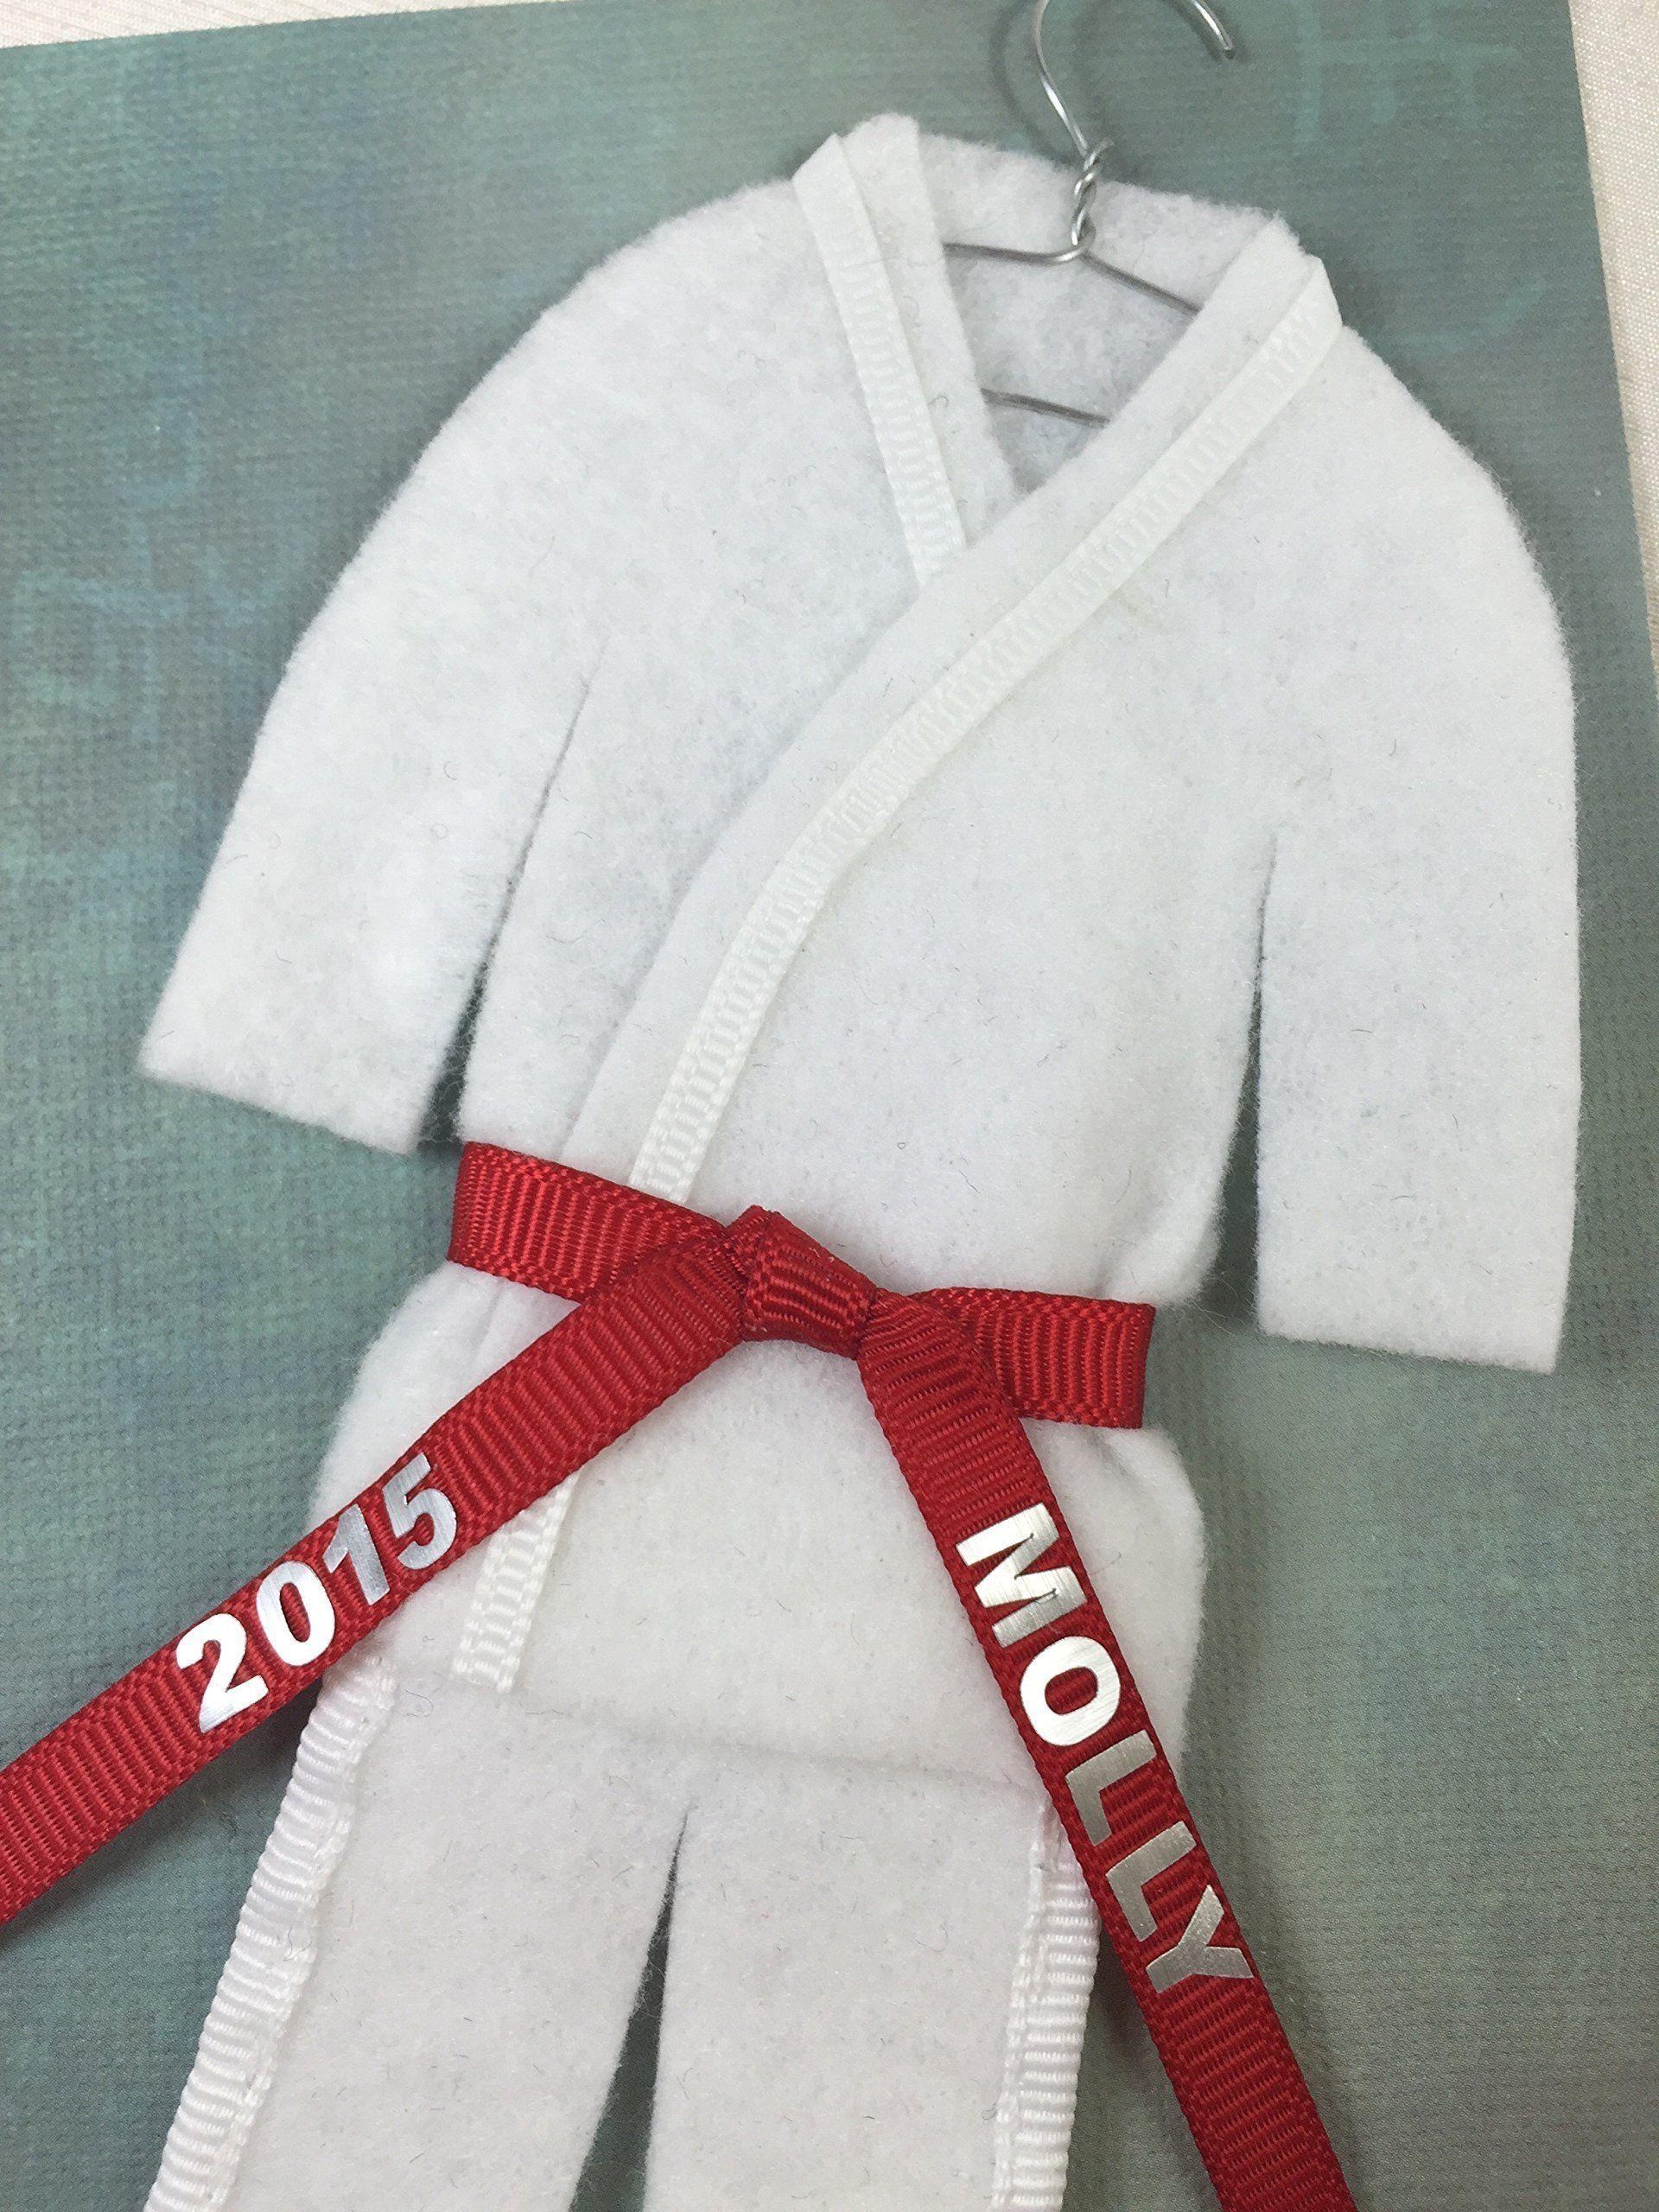 christmas ornament uniform martial arts personalized choose belt